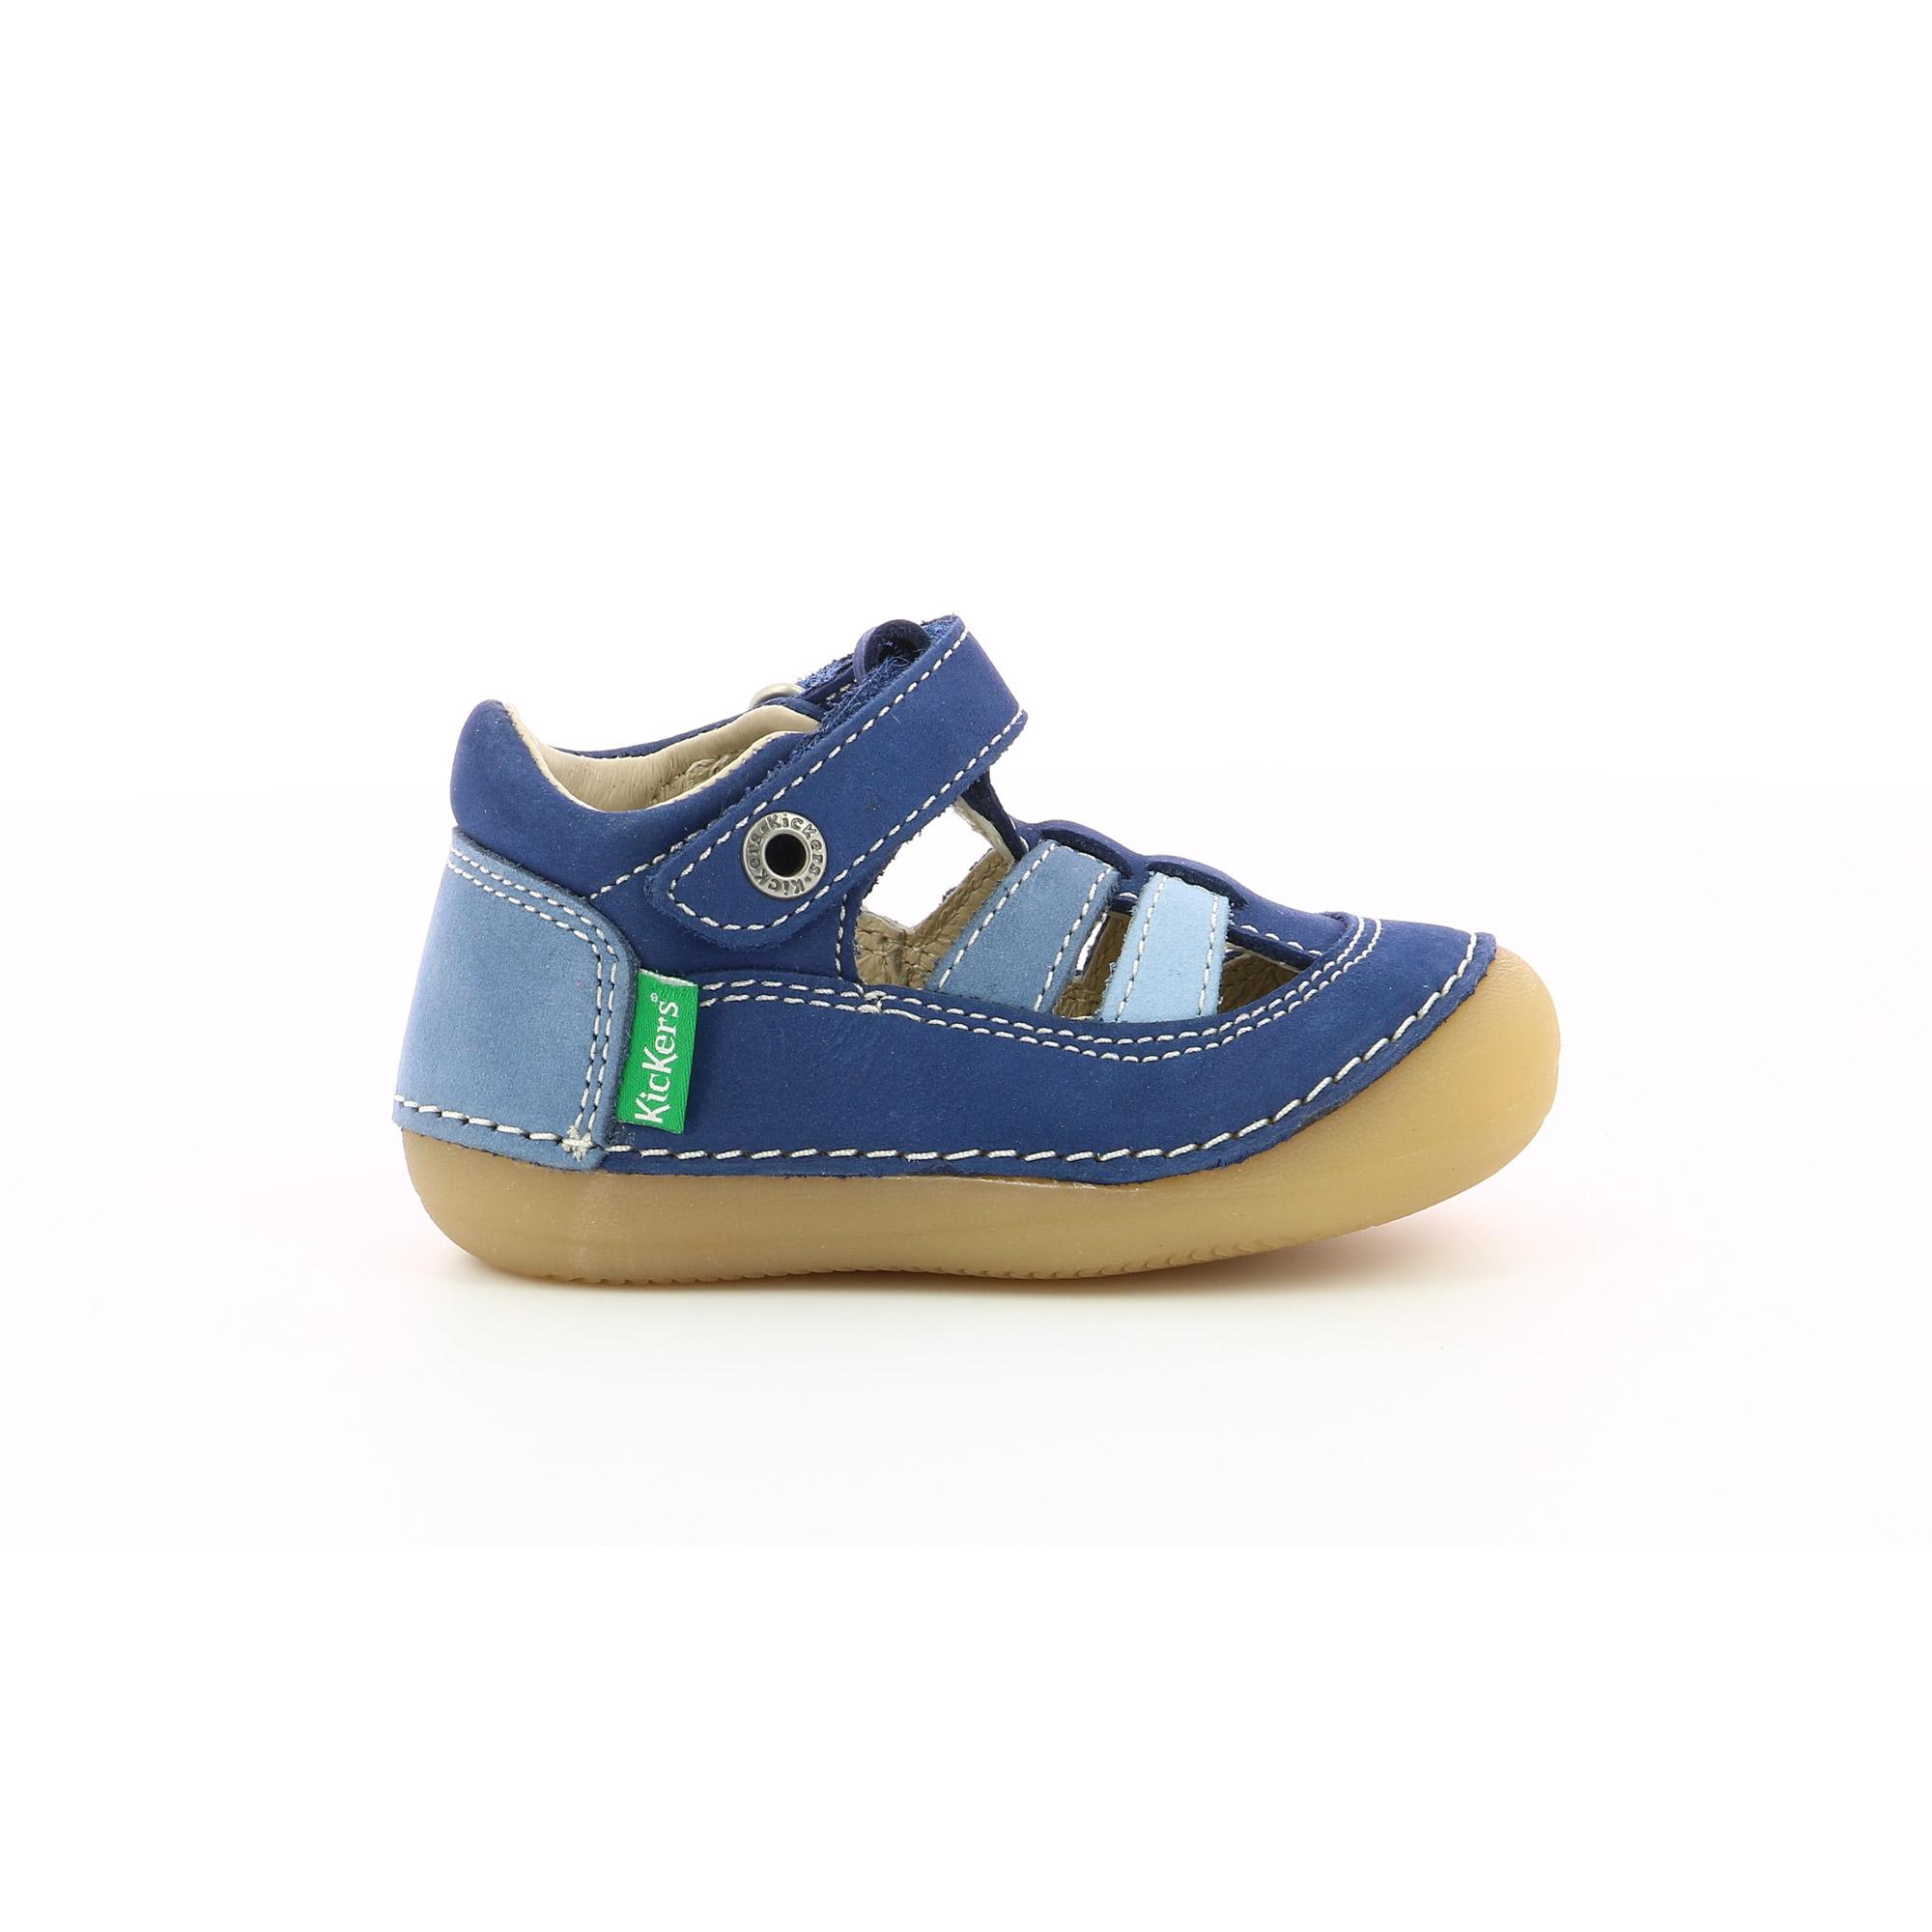 Chaussure Sushy Bleu tricolore  de Kickers